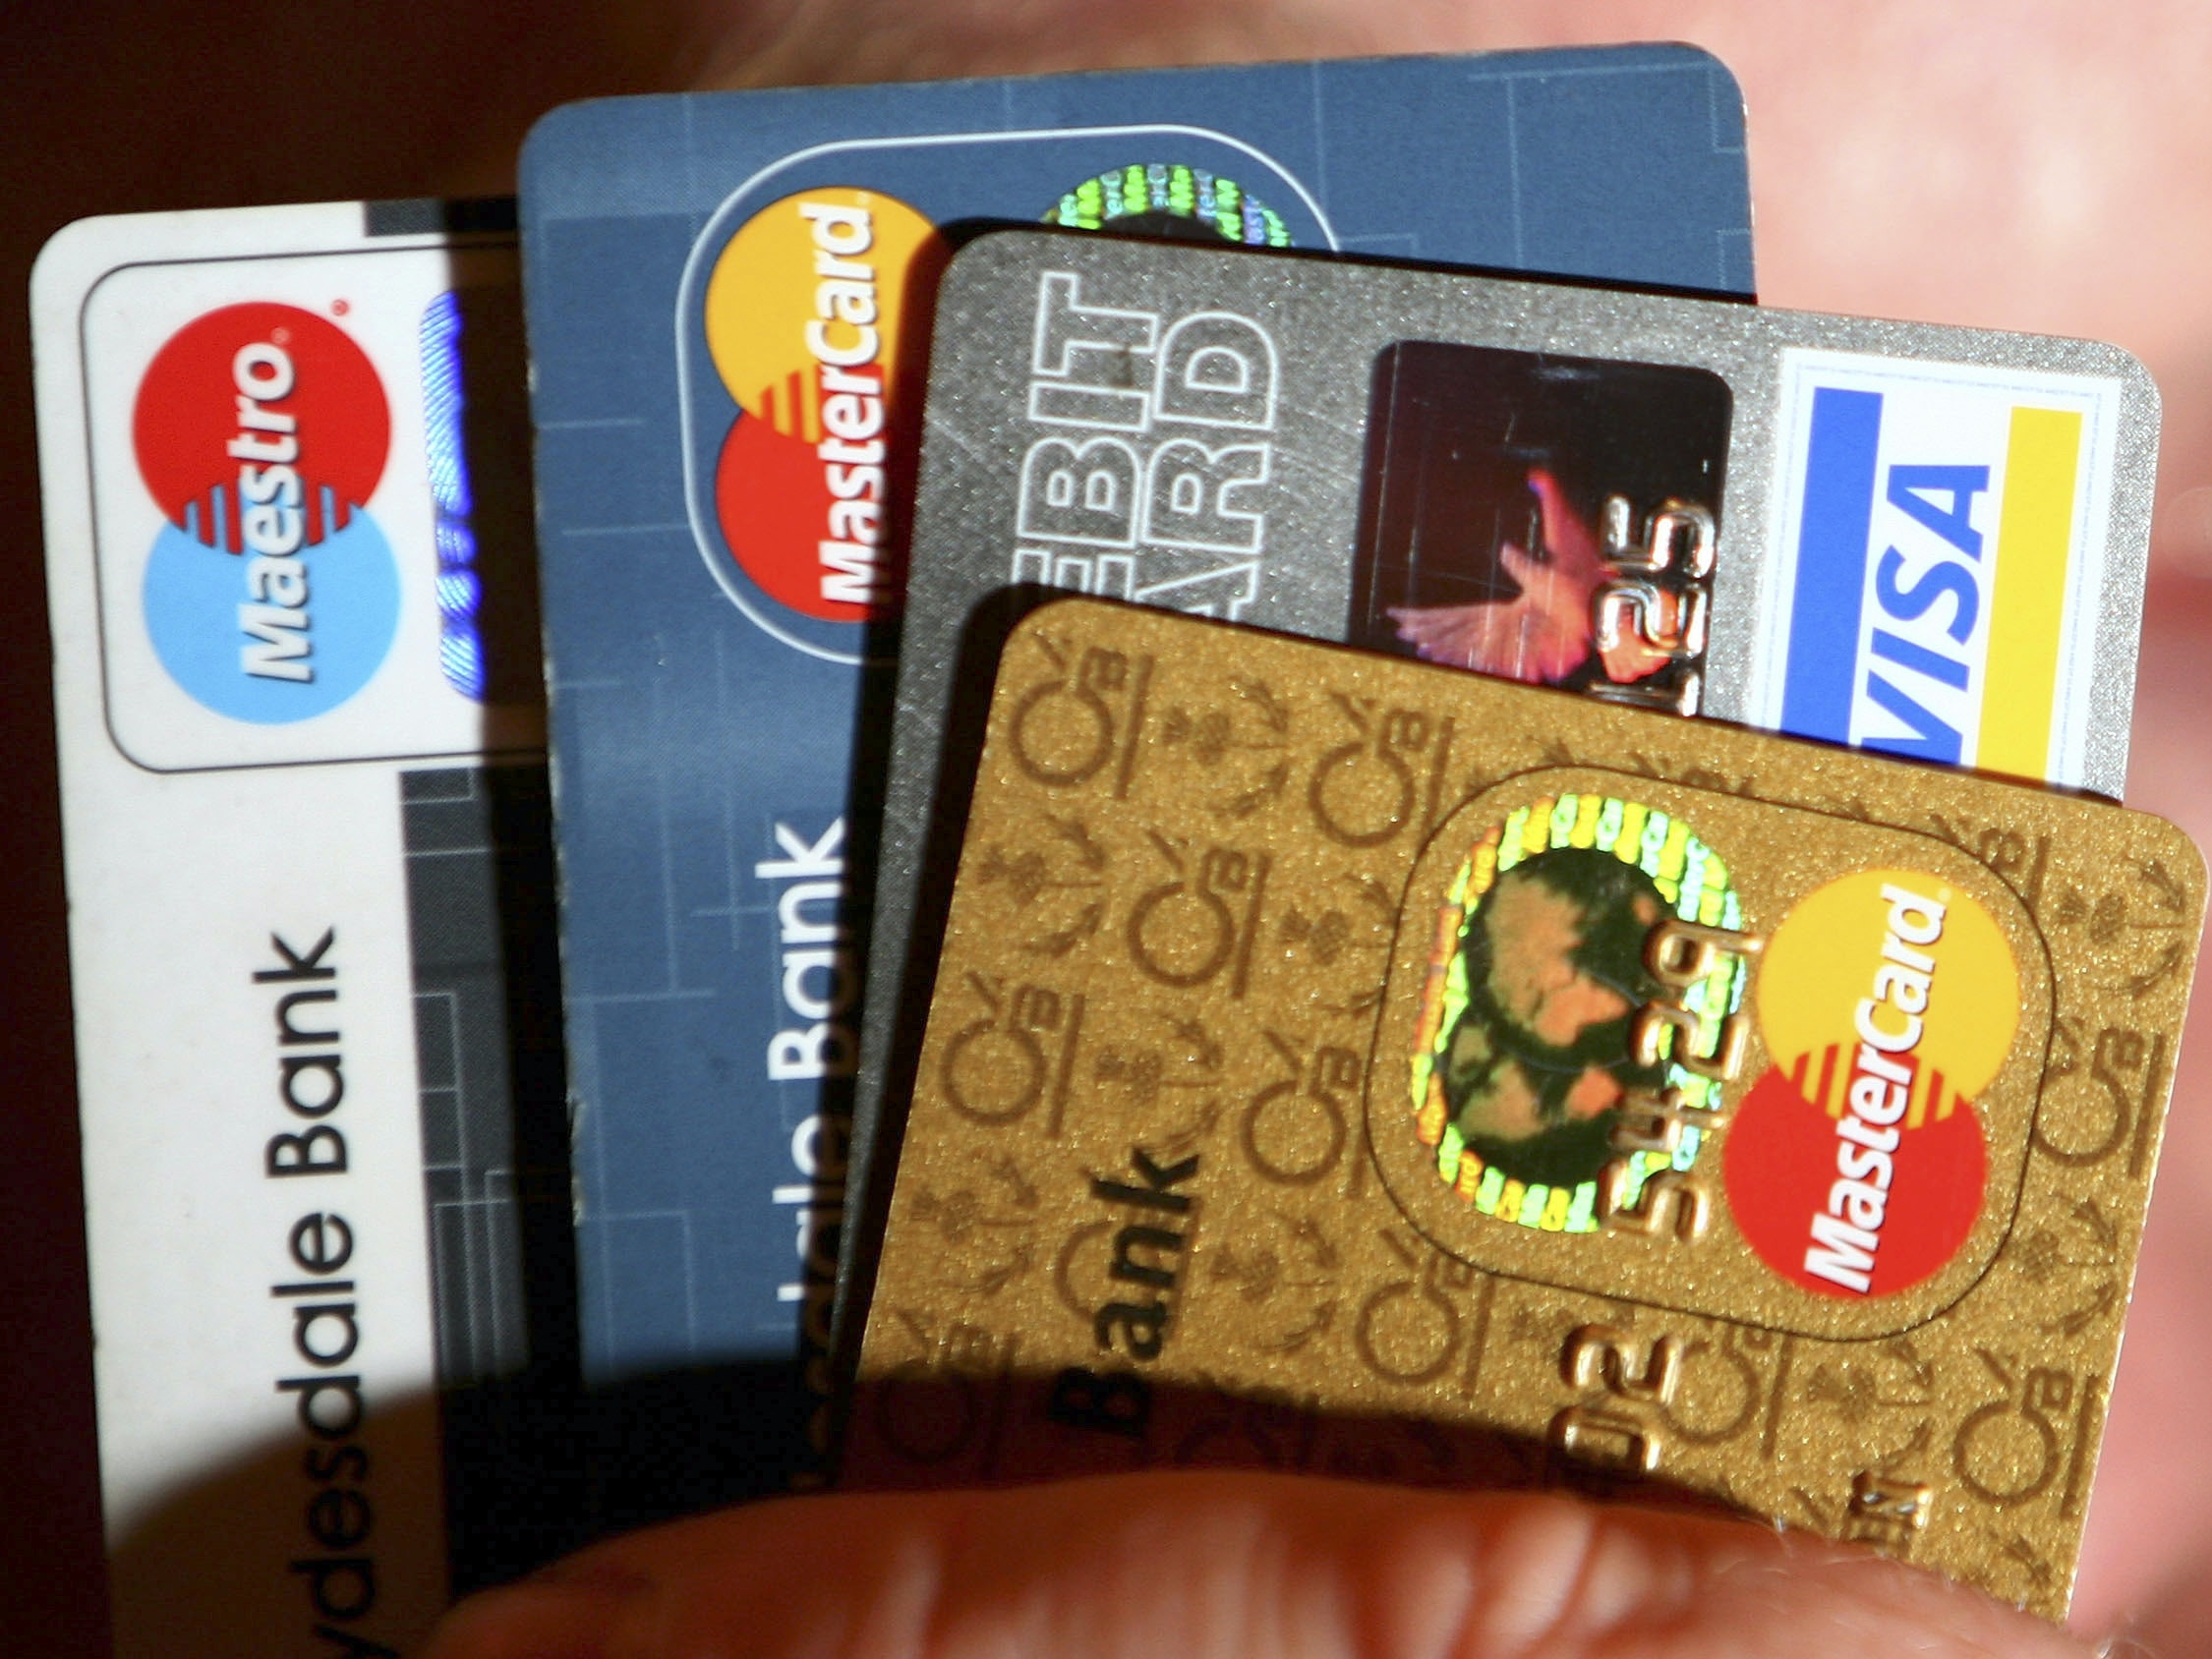 Cop a Zero APR Credit Card, Already